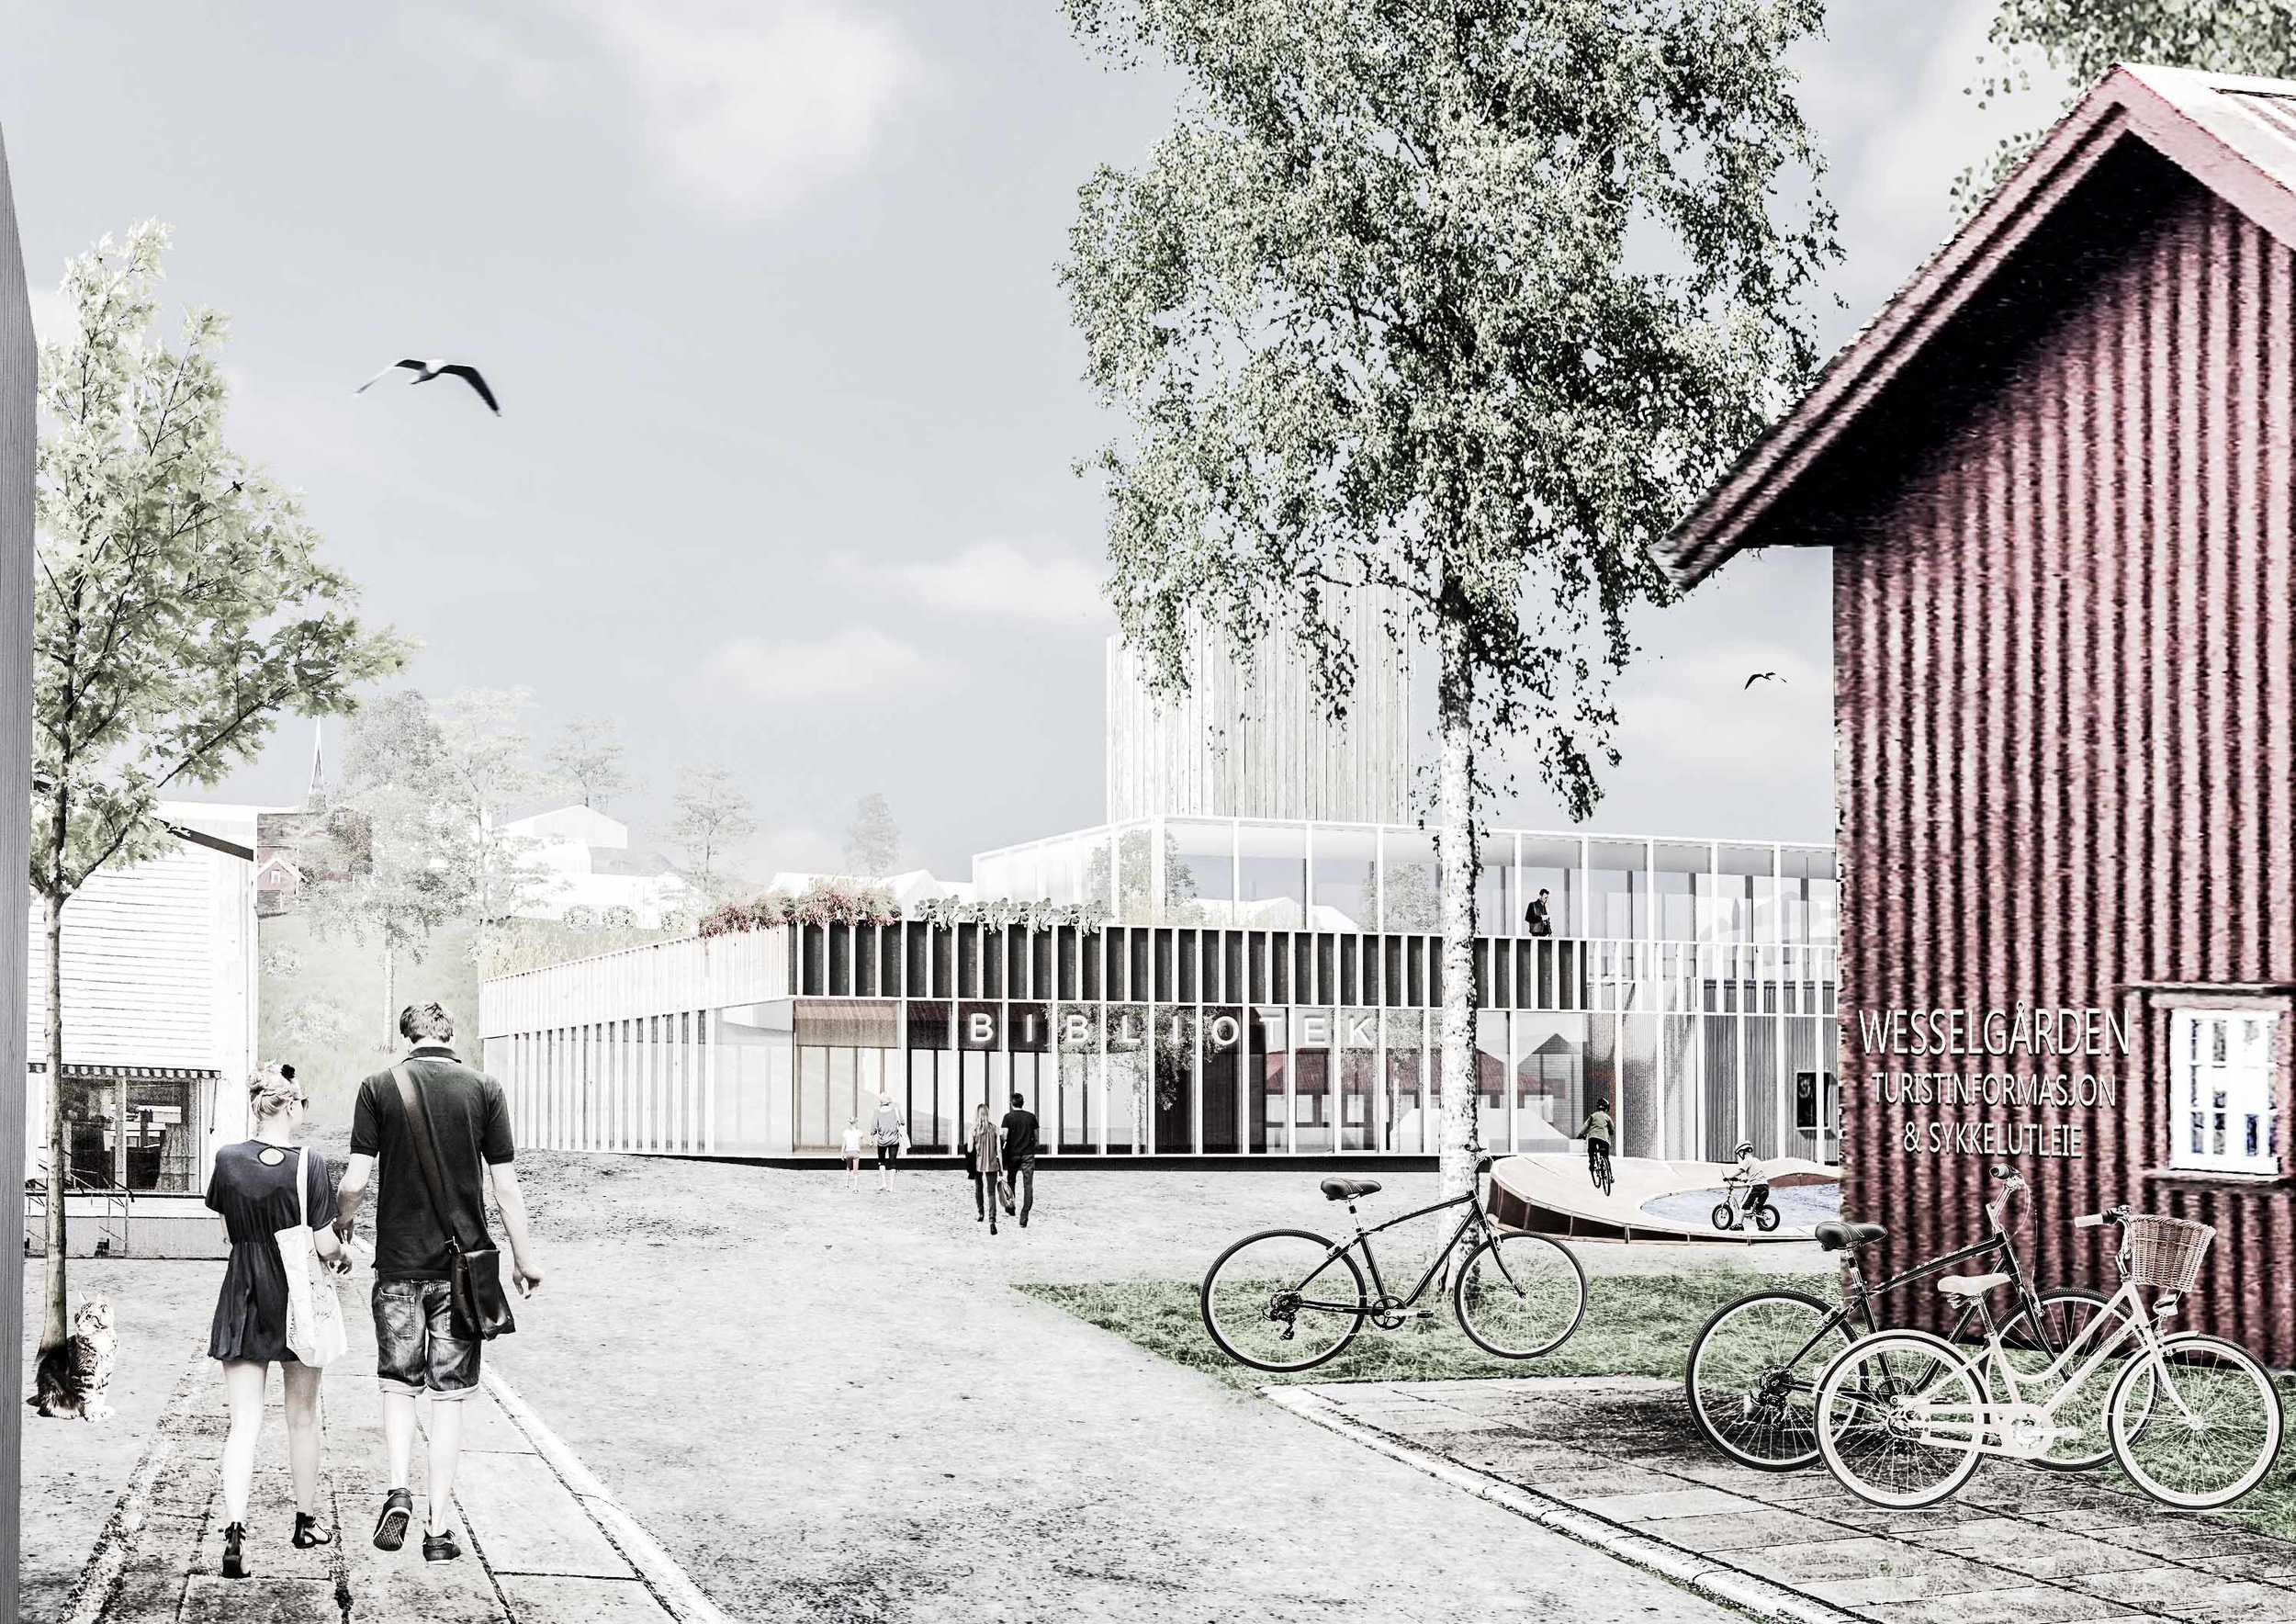 Forslag til et nytt biblioteksttilbygg ved Kulør'n.